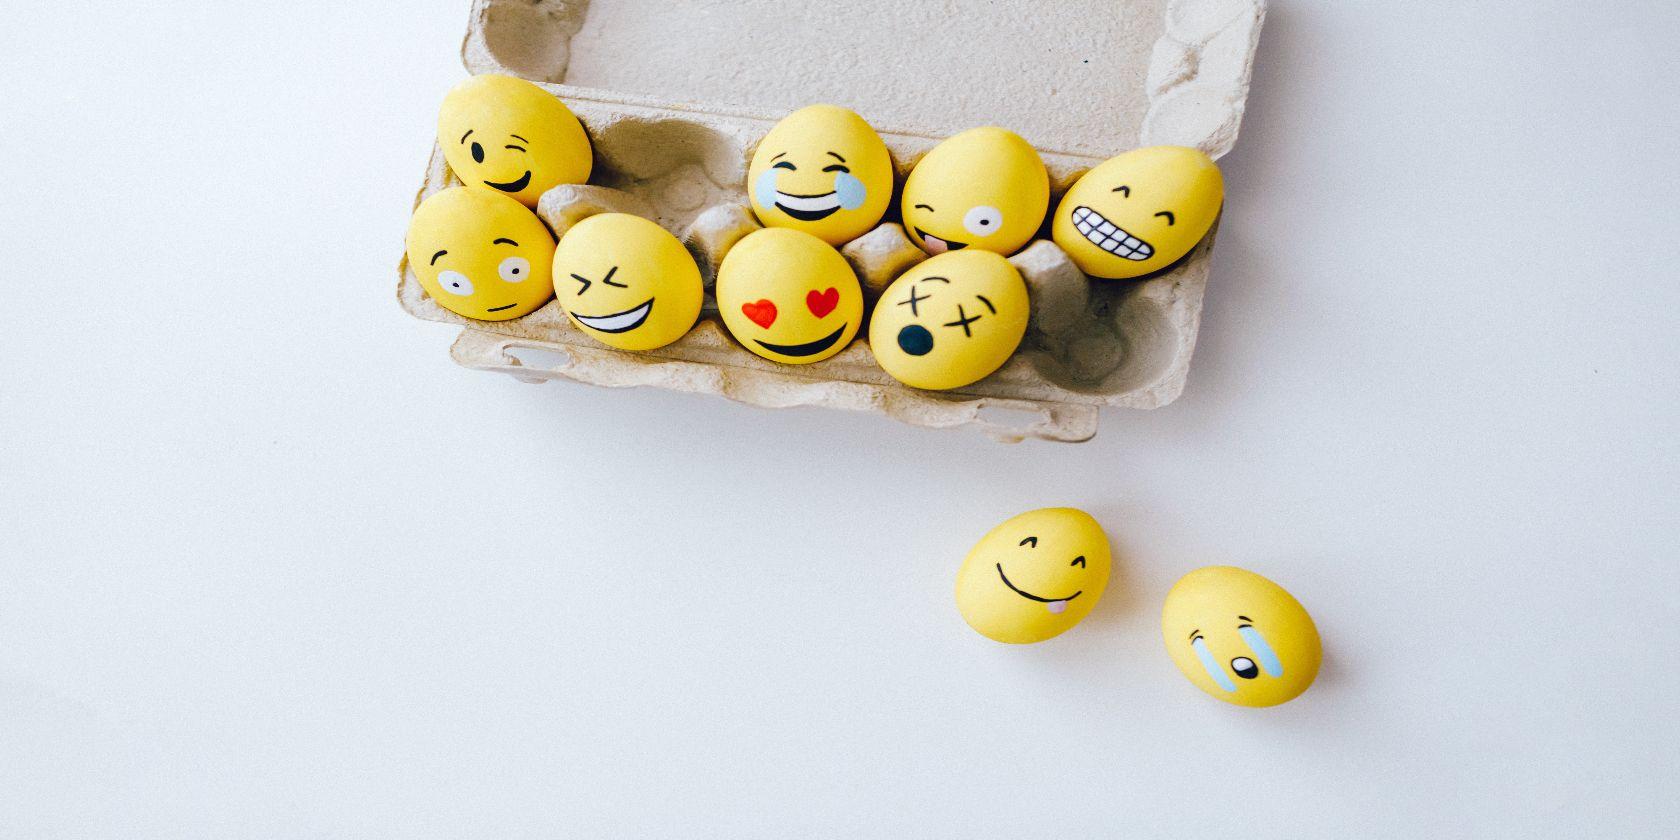 10 Ways to Increase Your Emotional Intelligence